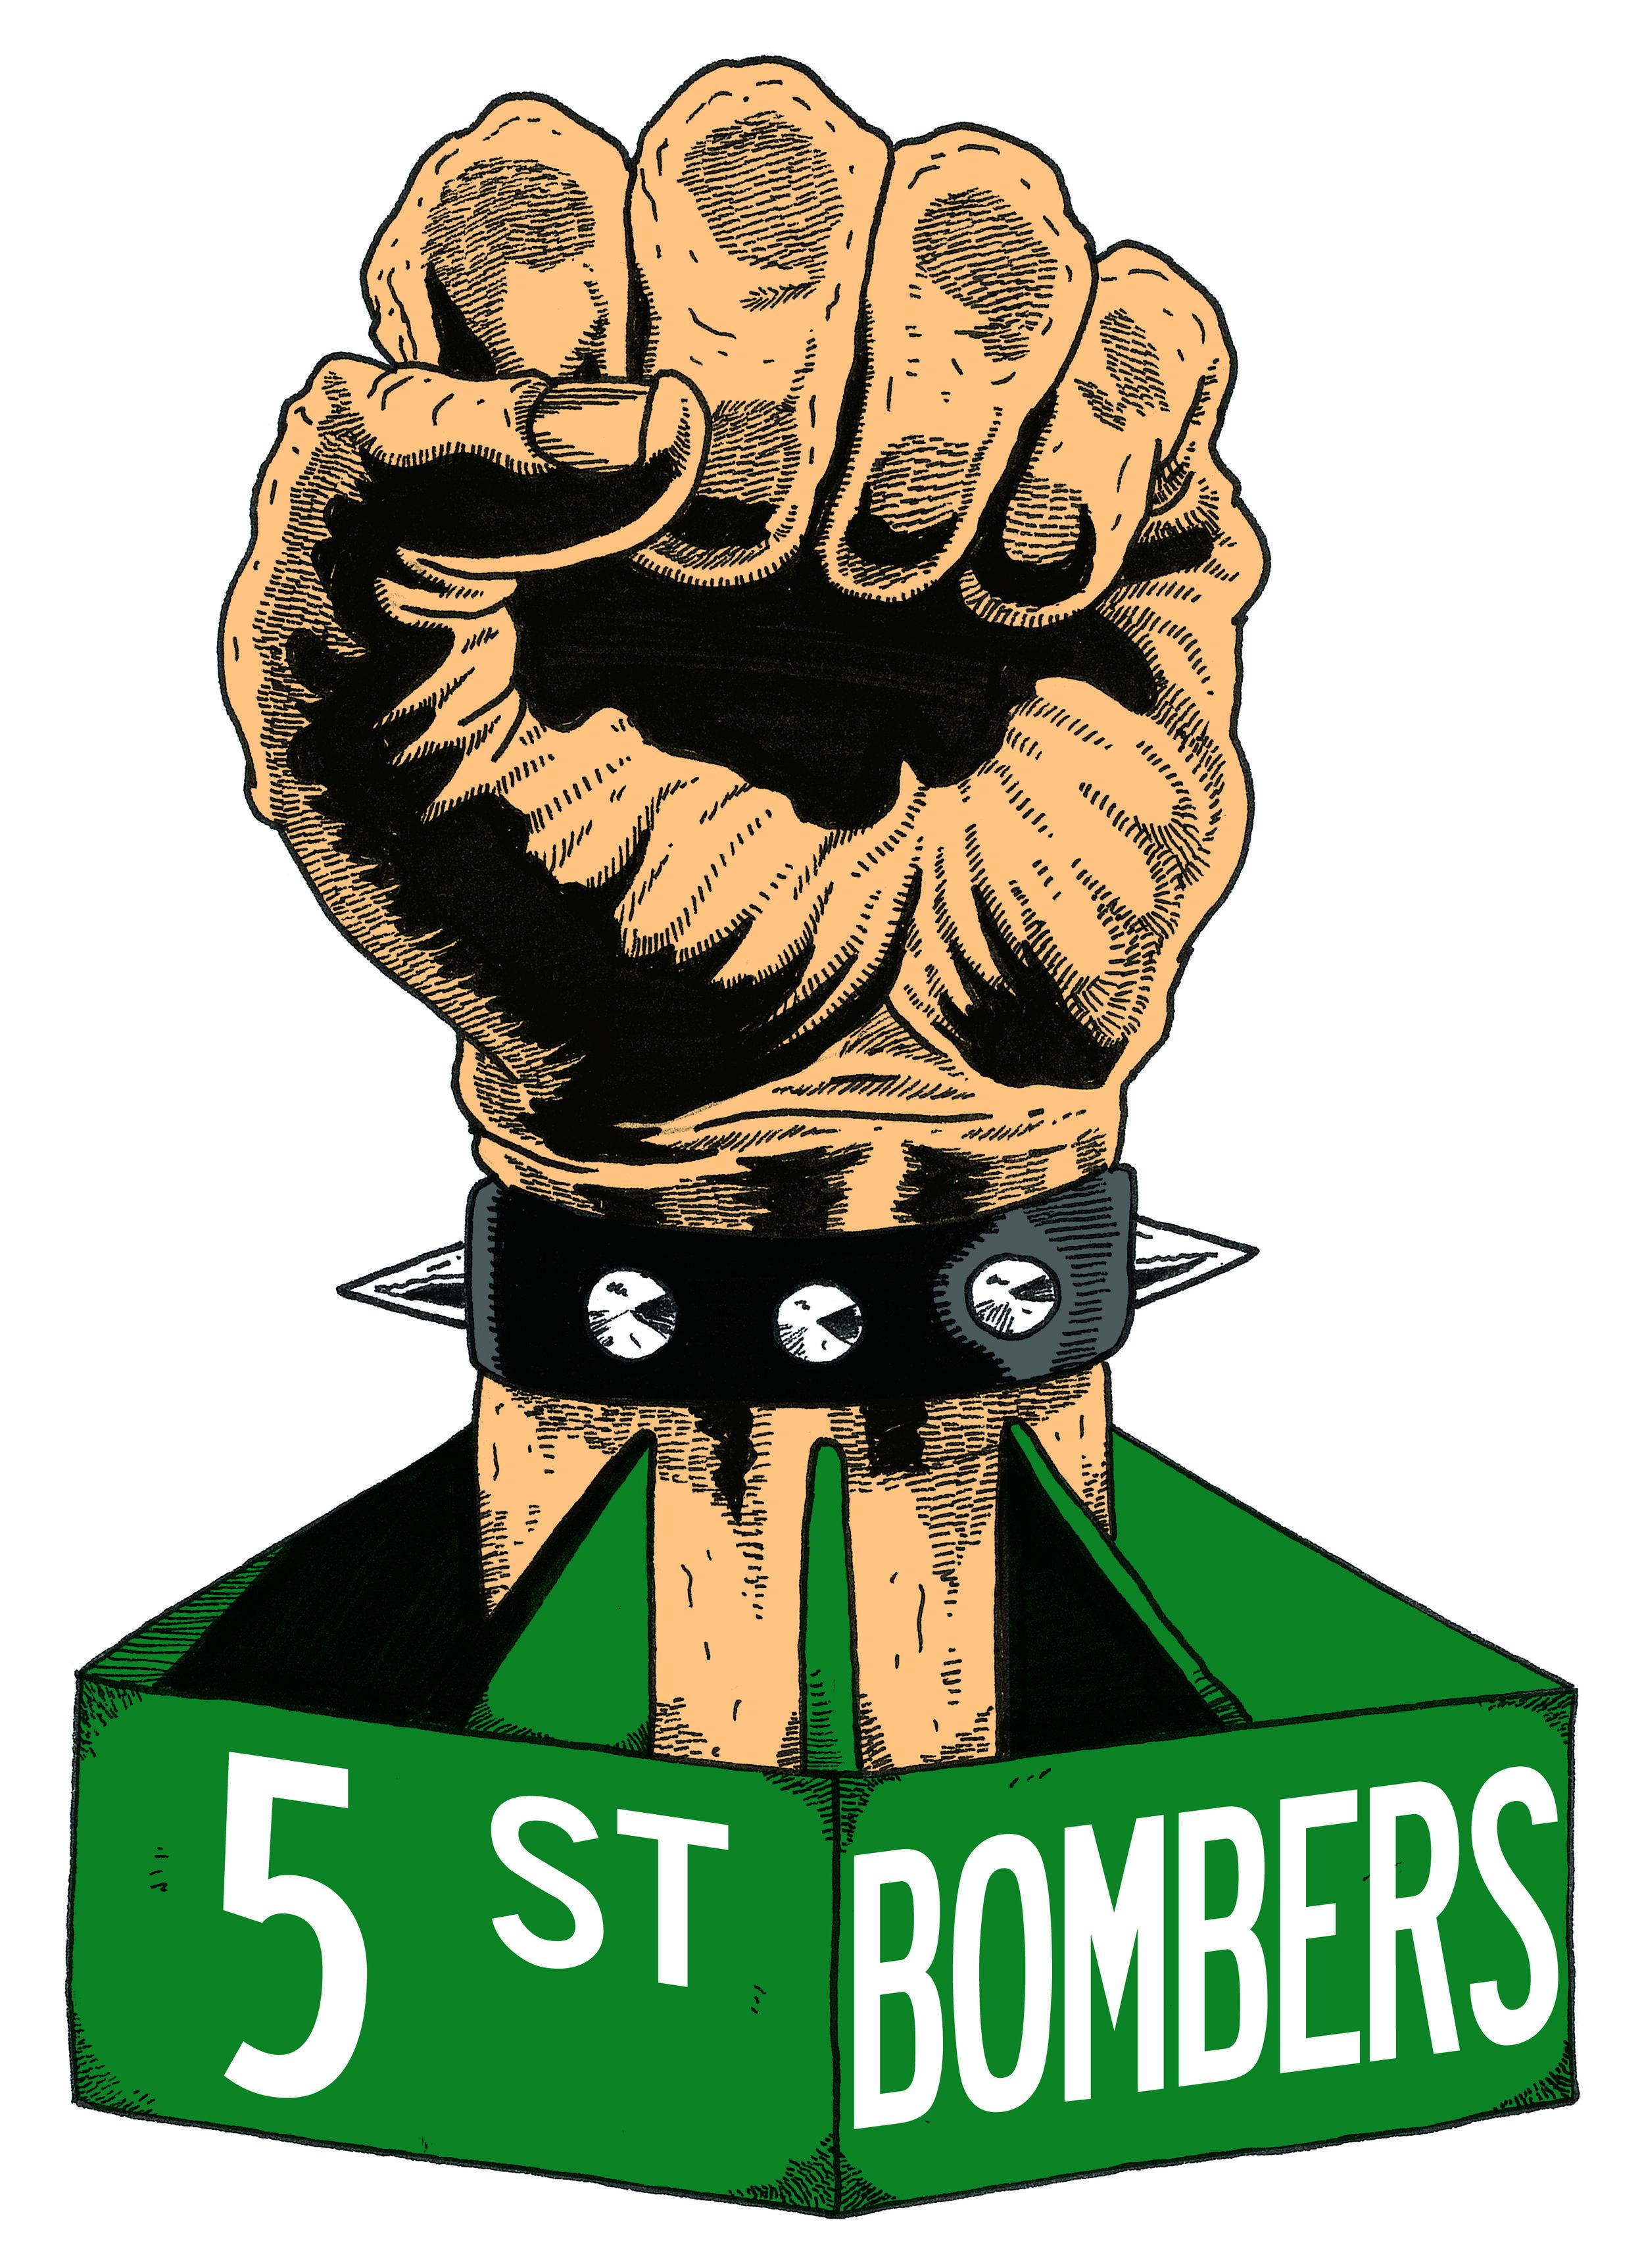 5th Street Bombers